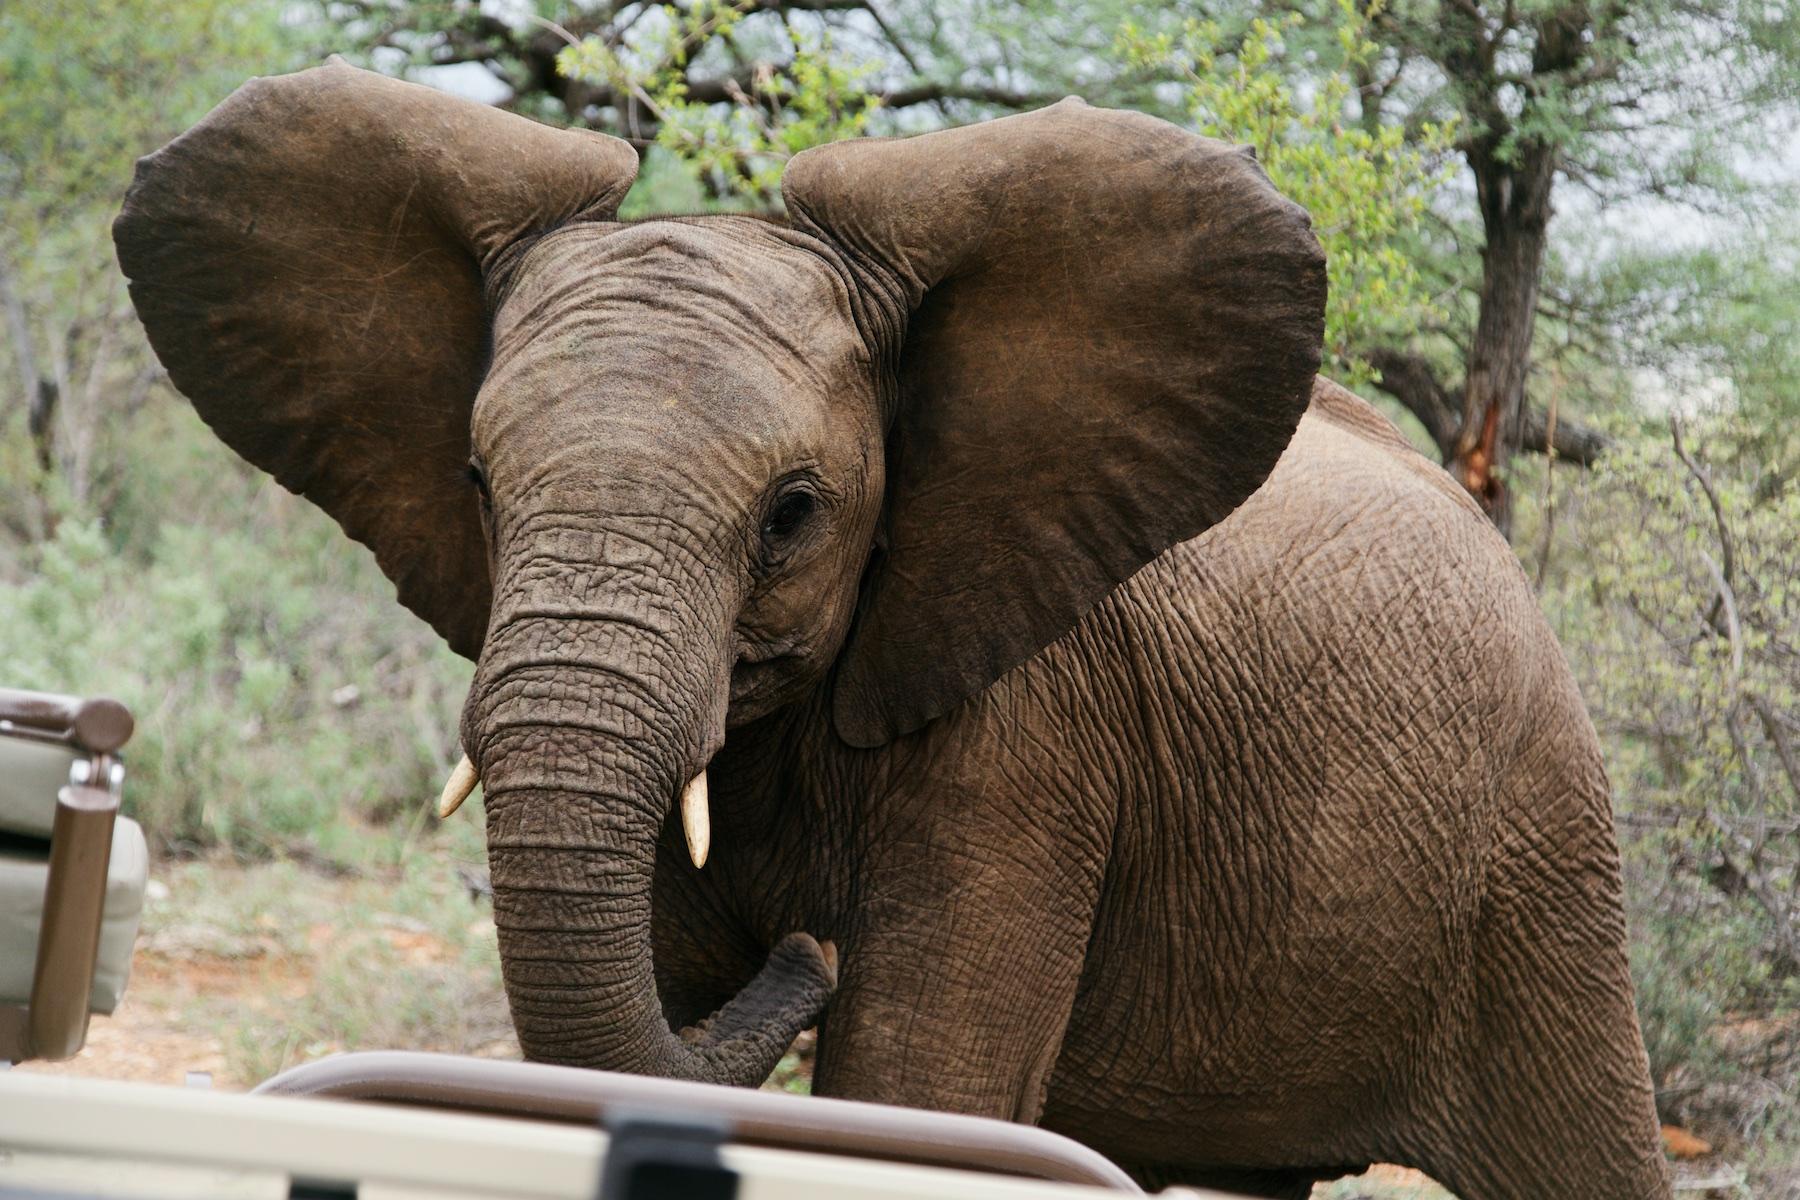 Elephant showing off!